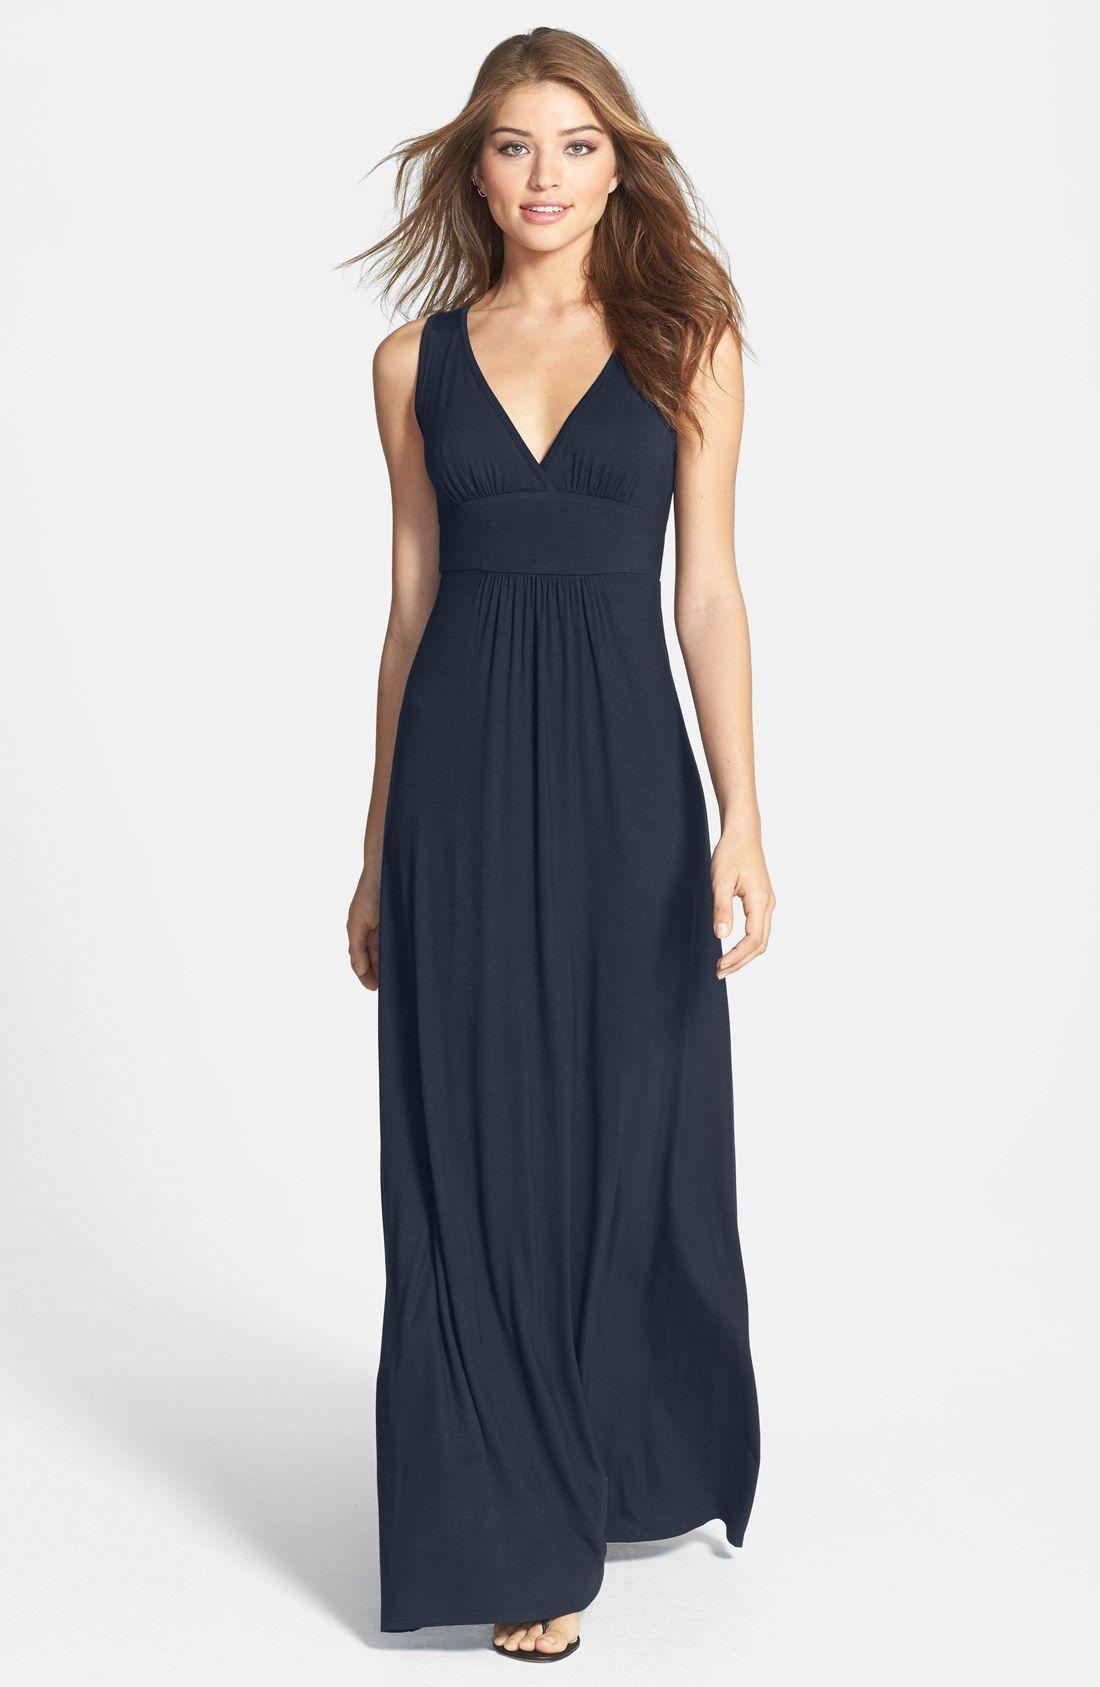 Black black t shirt maxi dress - I Love Long Black Summer Dresses